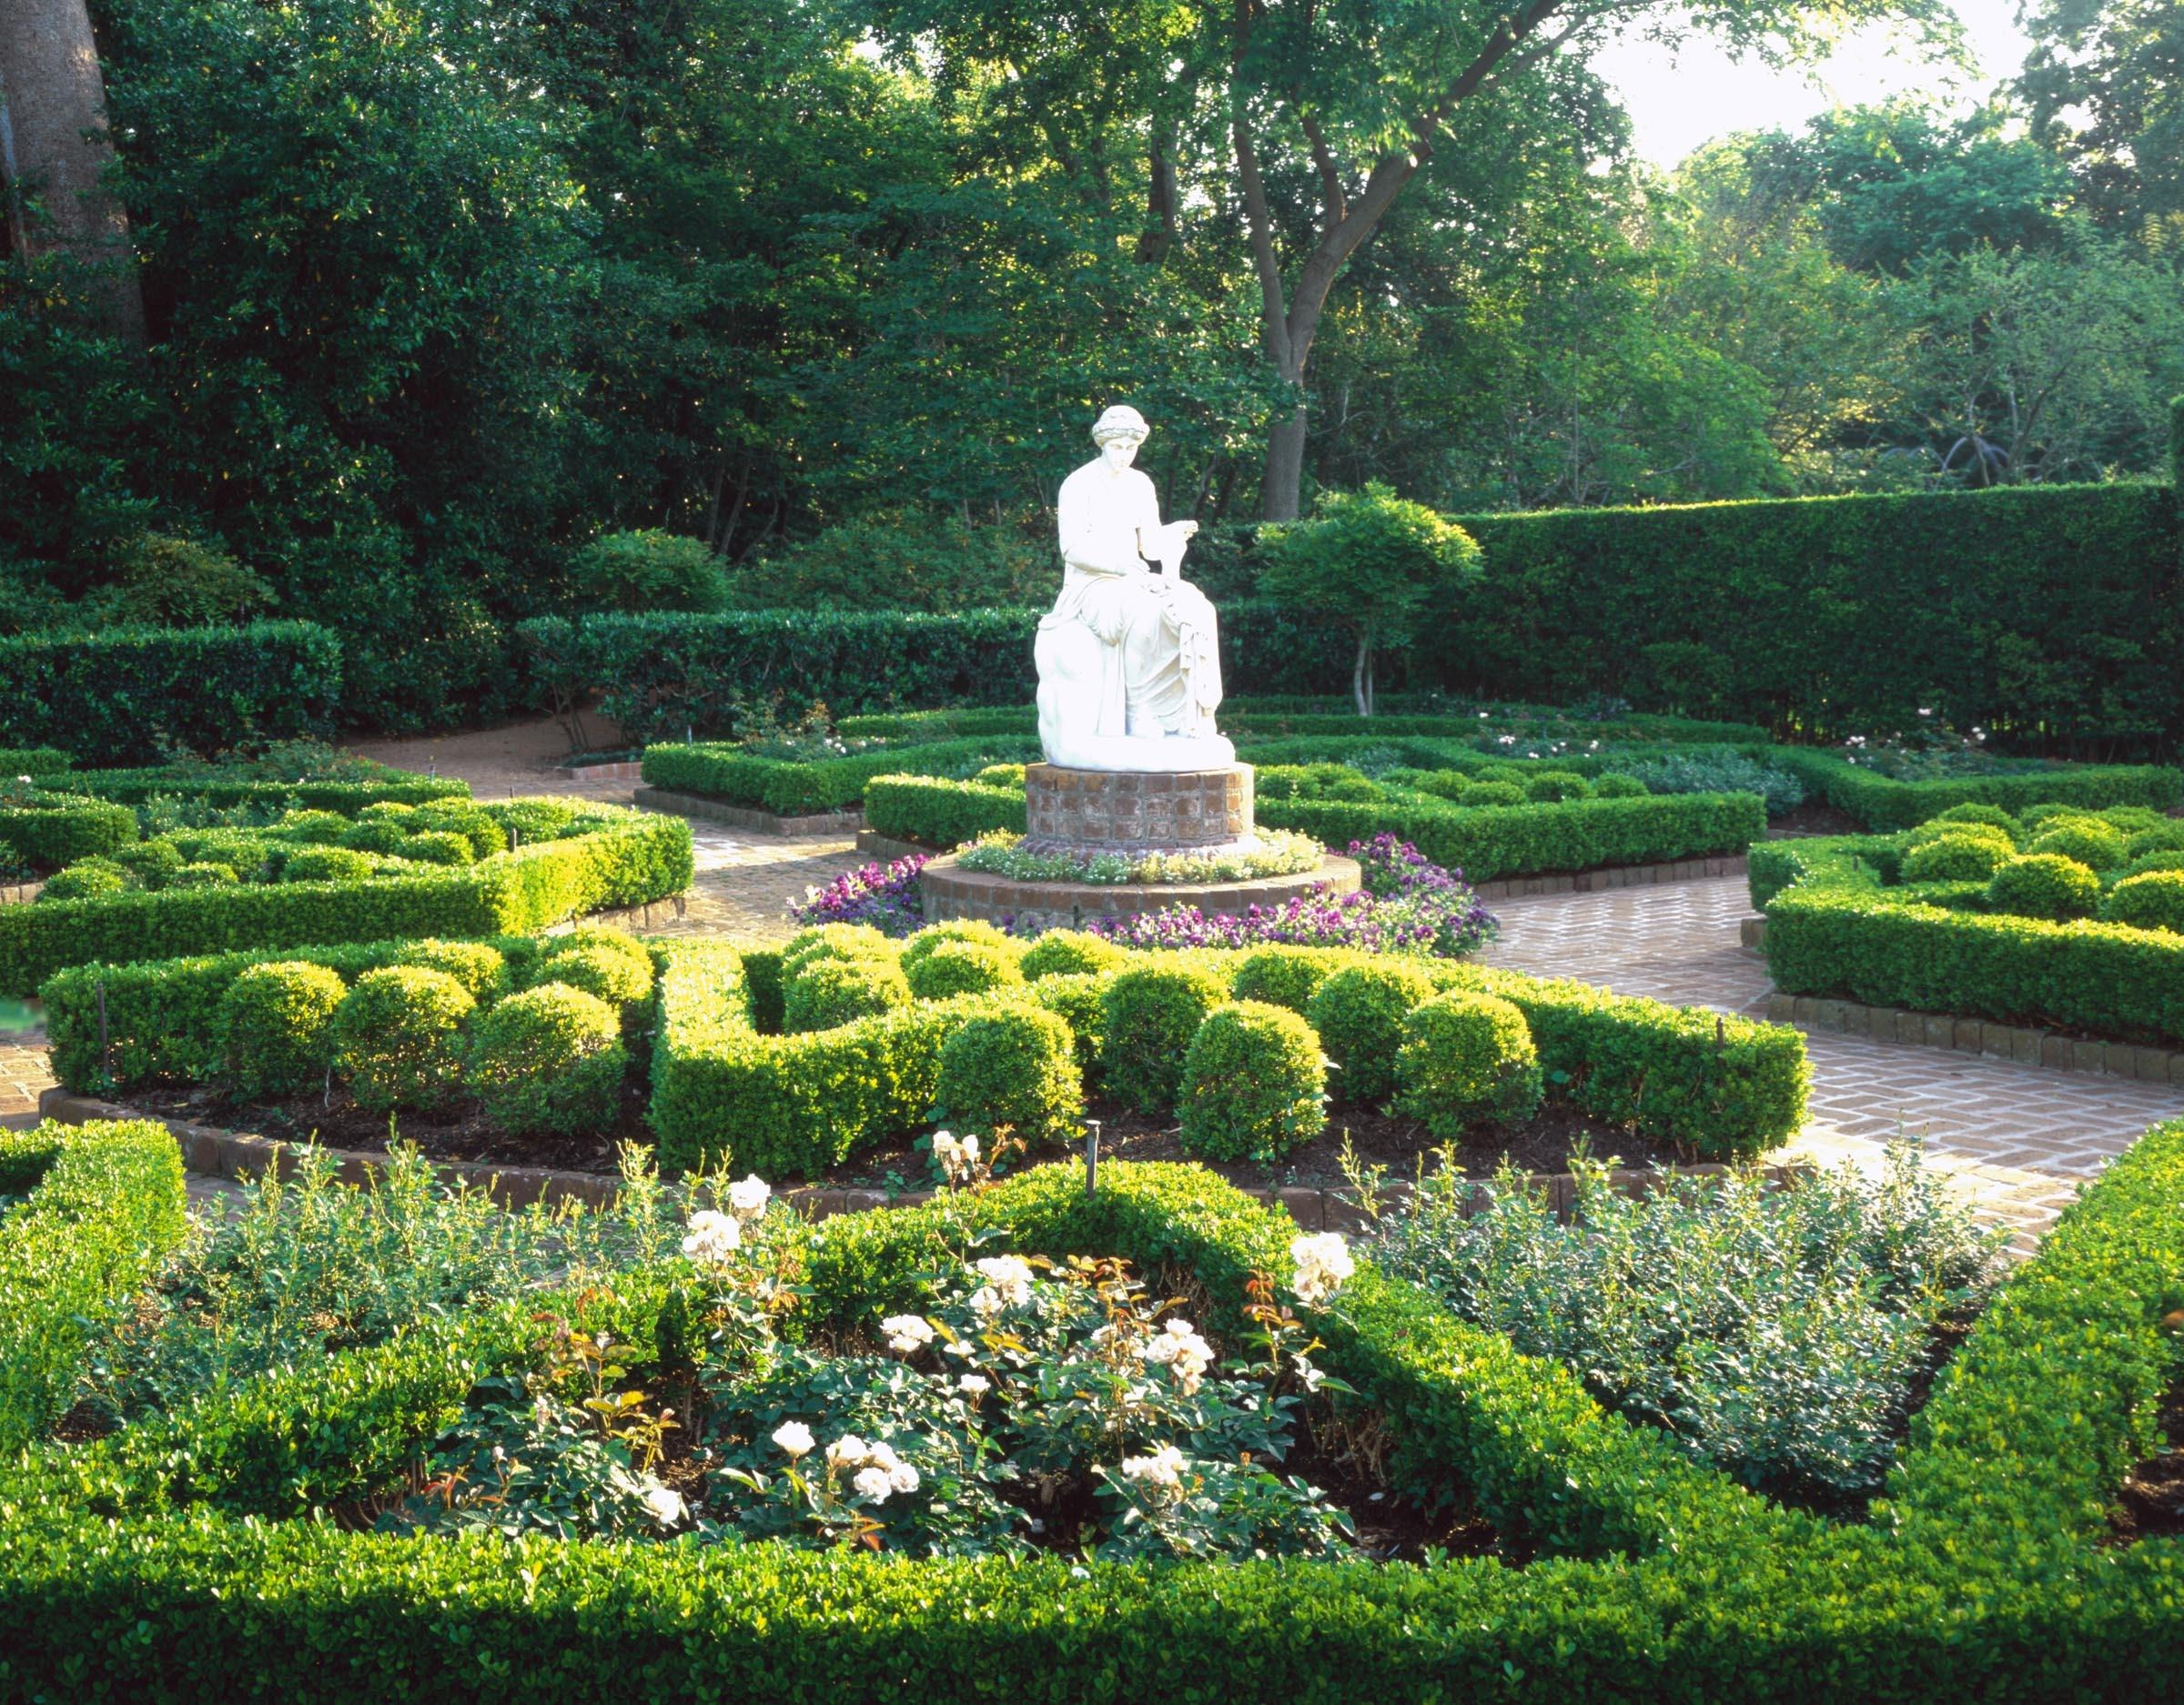 Awesome Bayou Bend Gardens